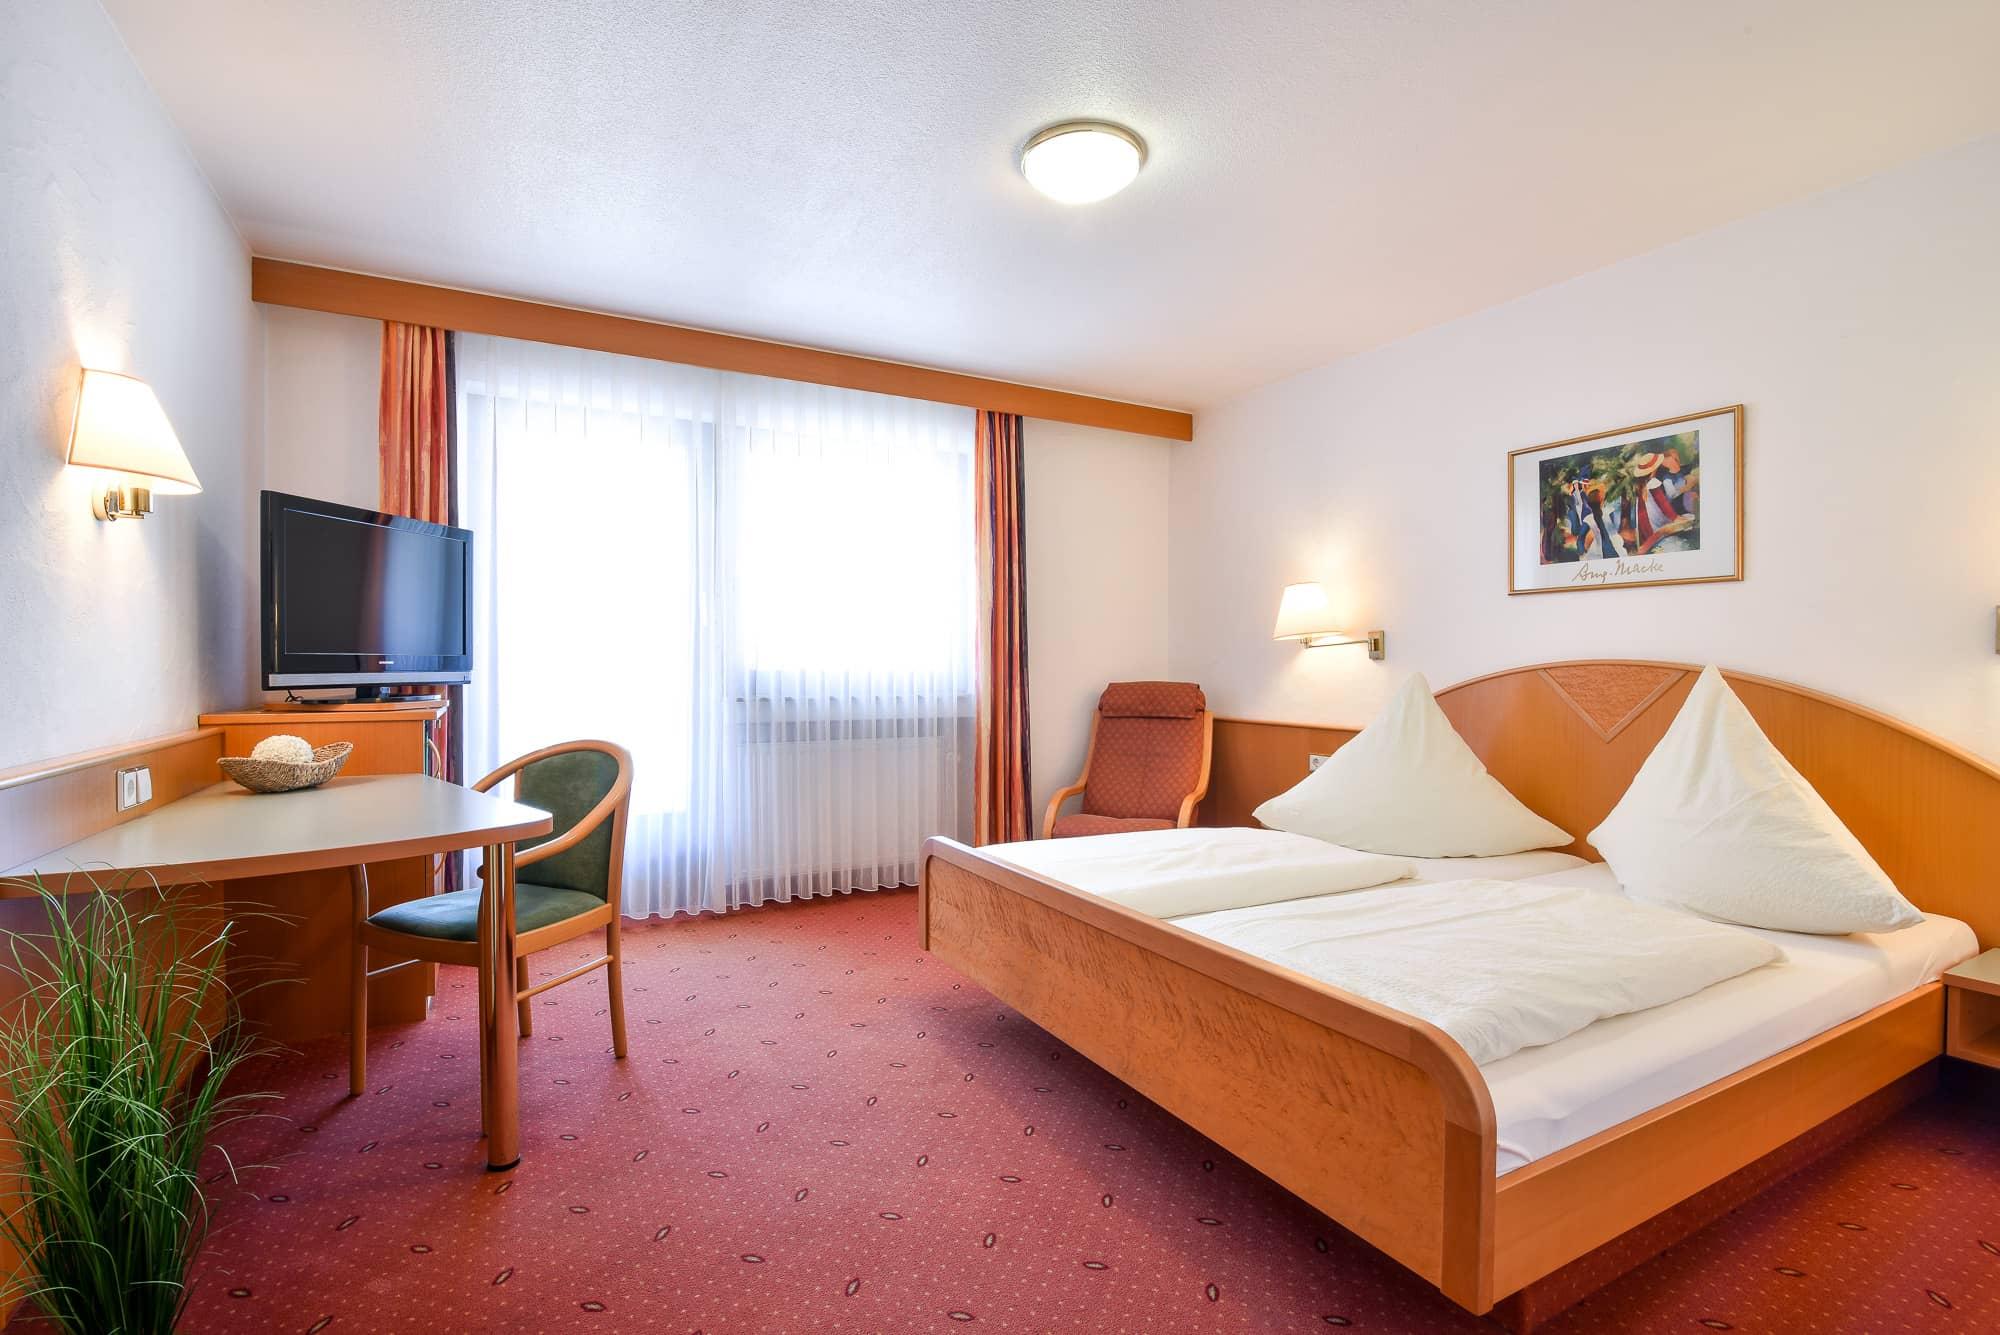 Hotelfotografie - Pension - Ferienhaus